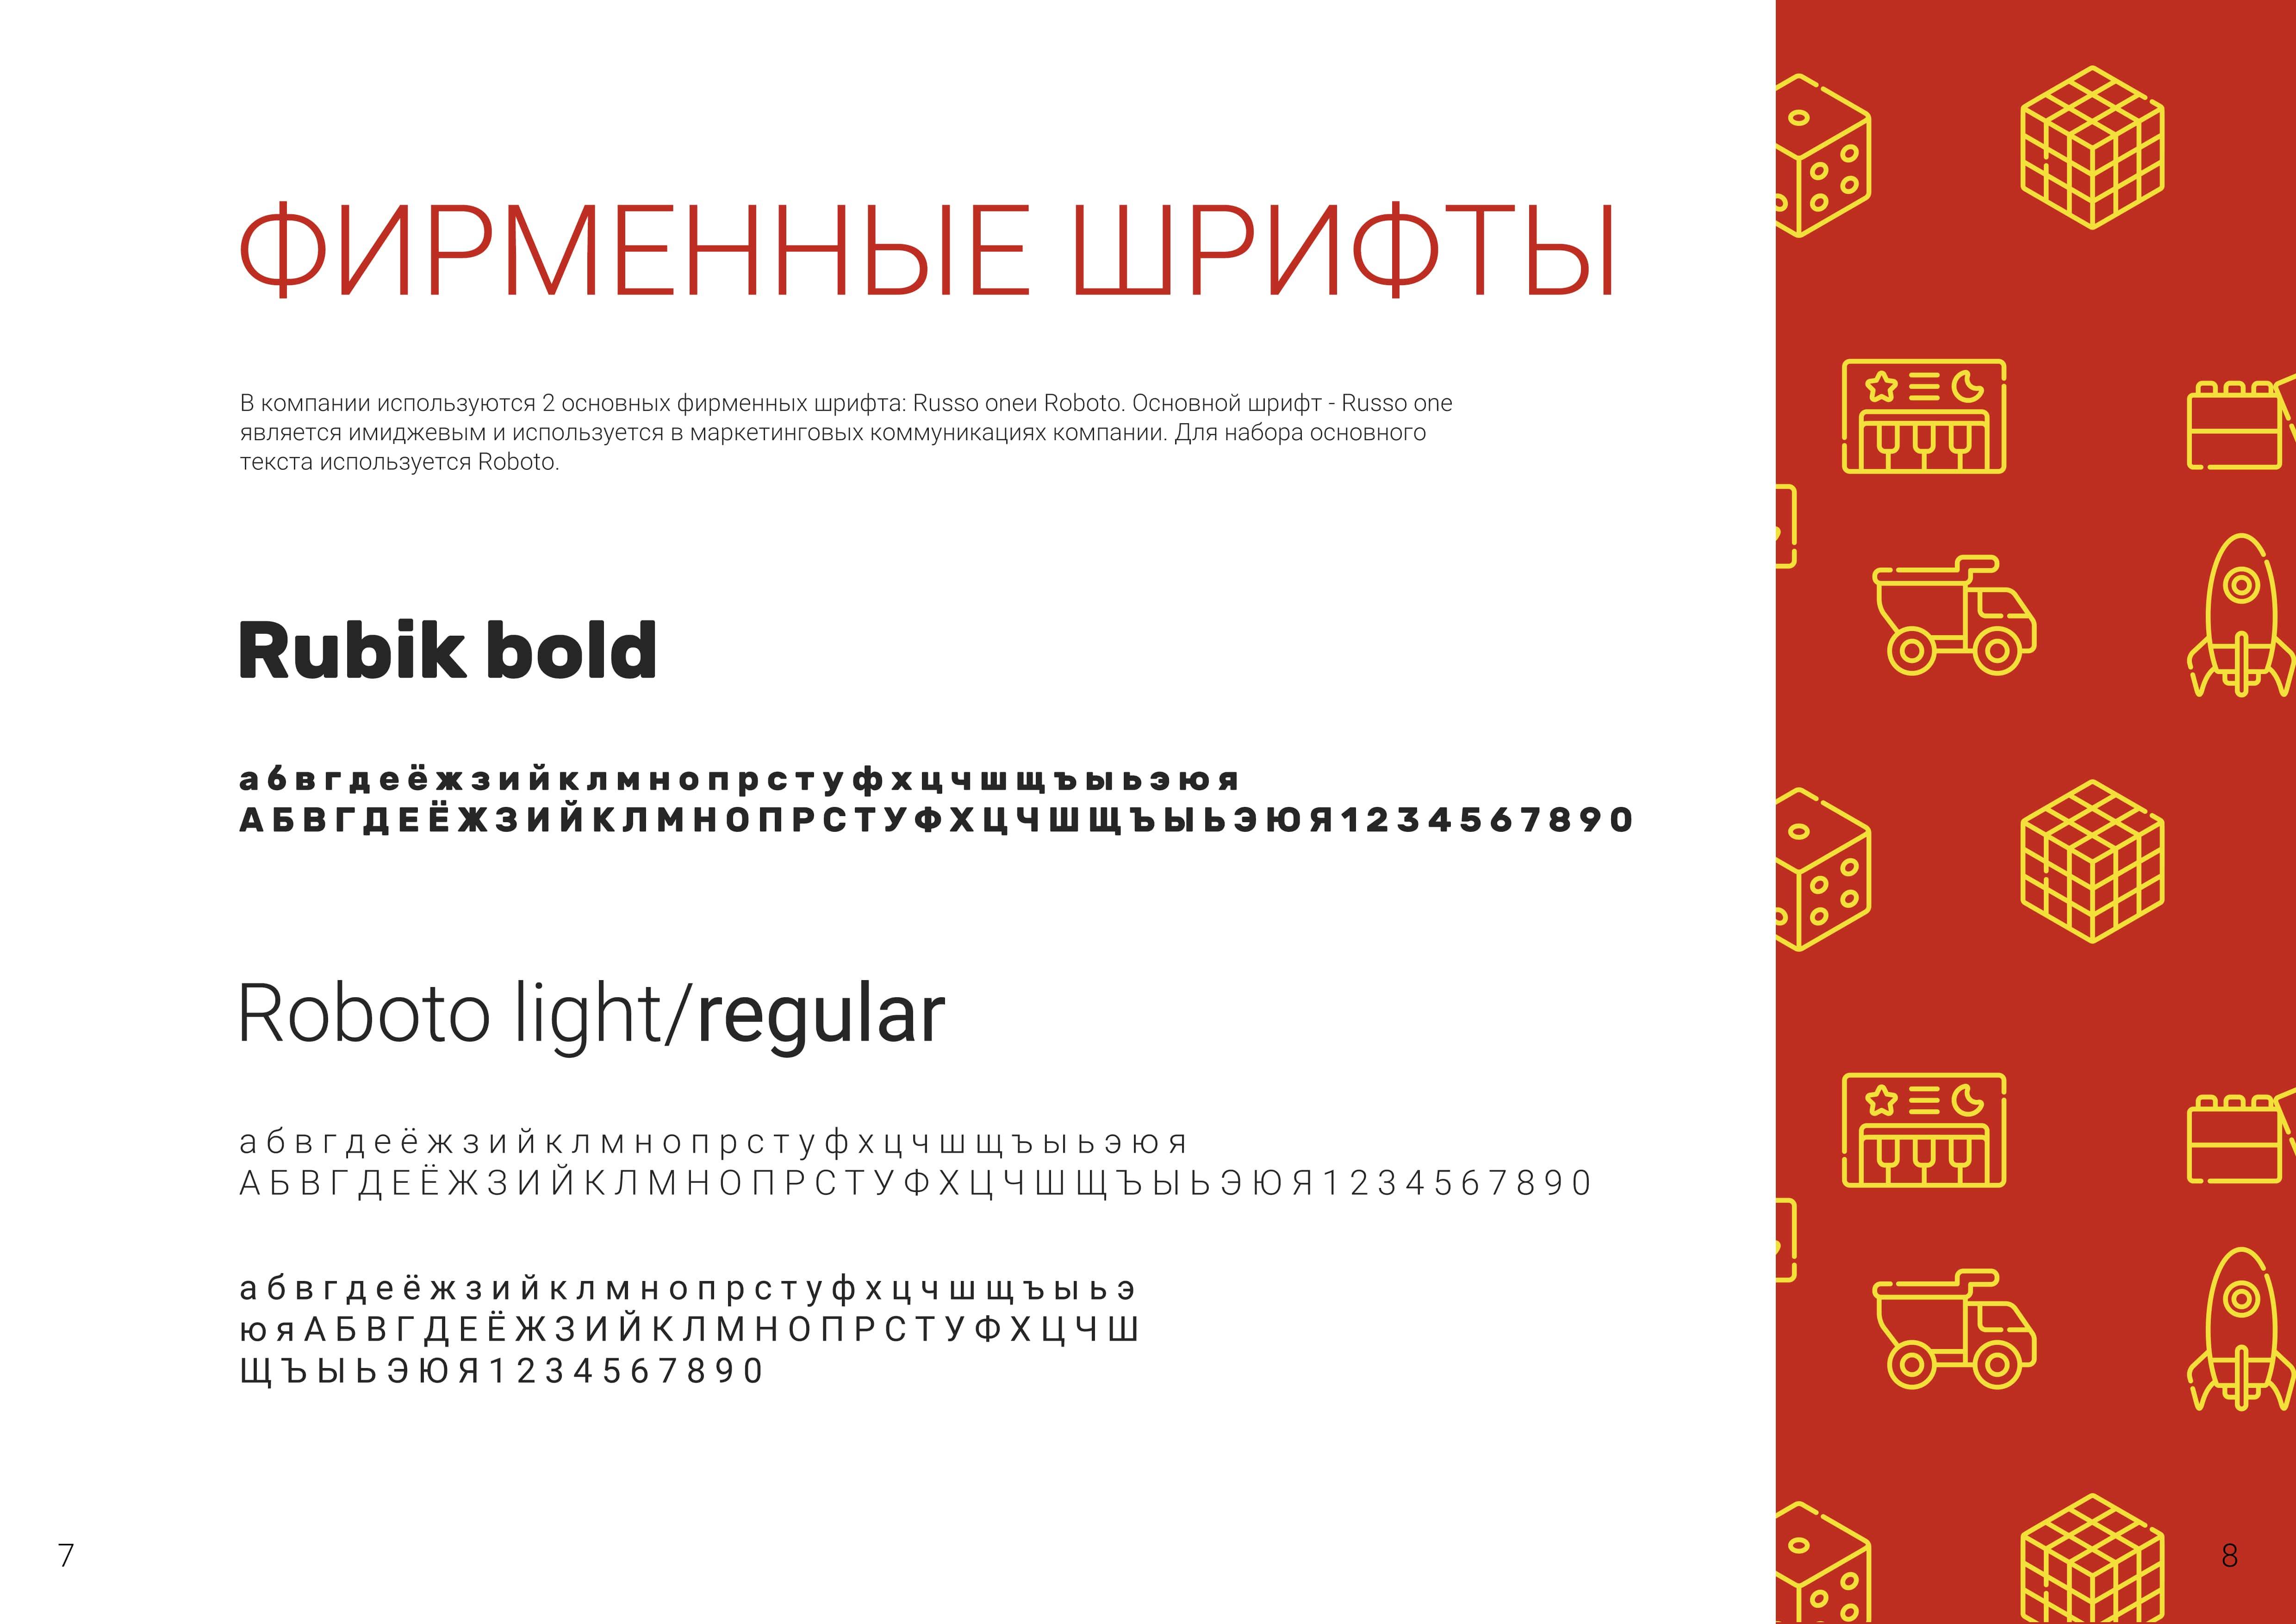 Разработка фирменного стиля на основании готового логотипа фото f_9035aba494ac5280.jpg